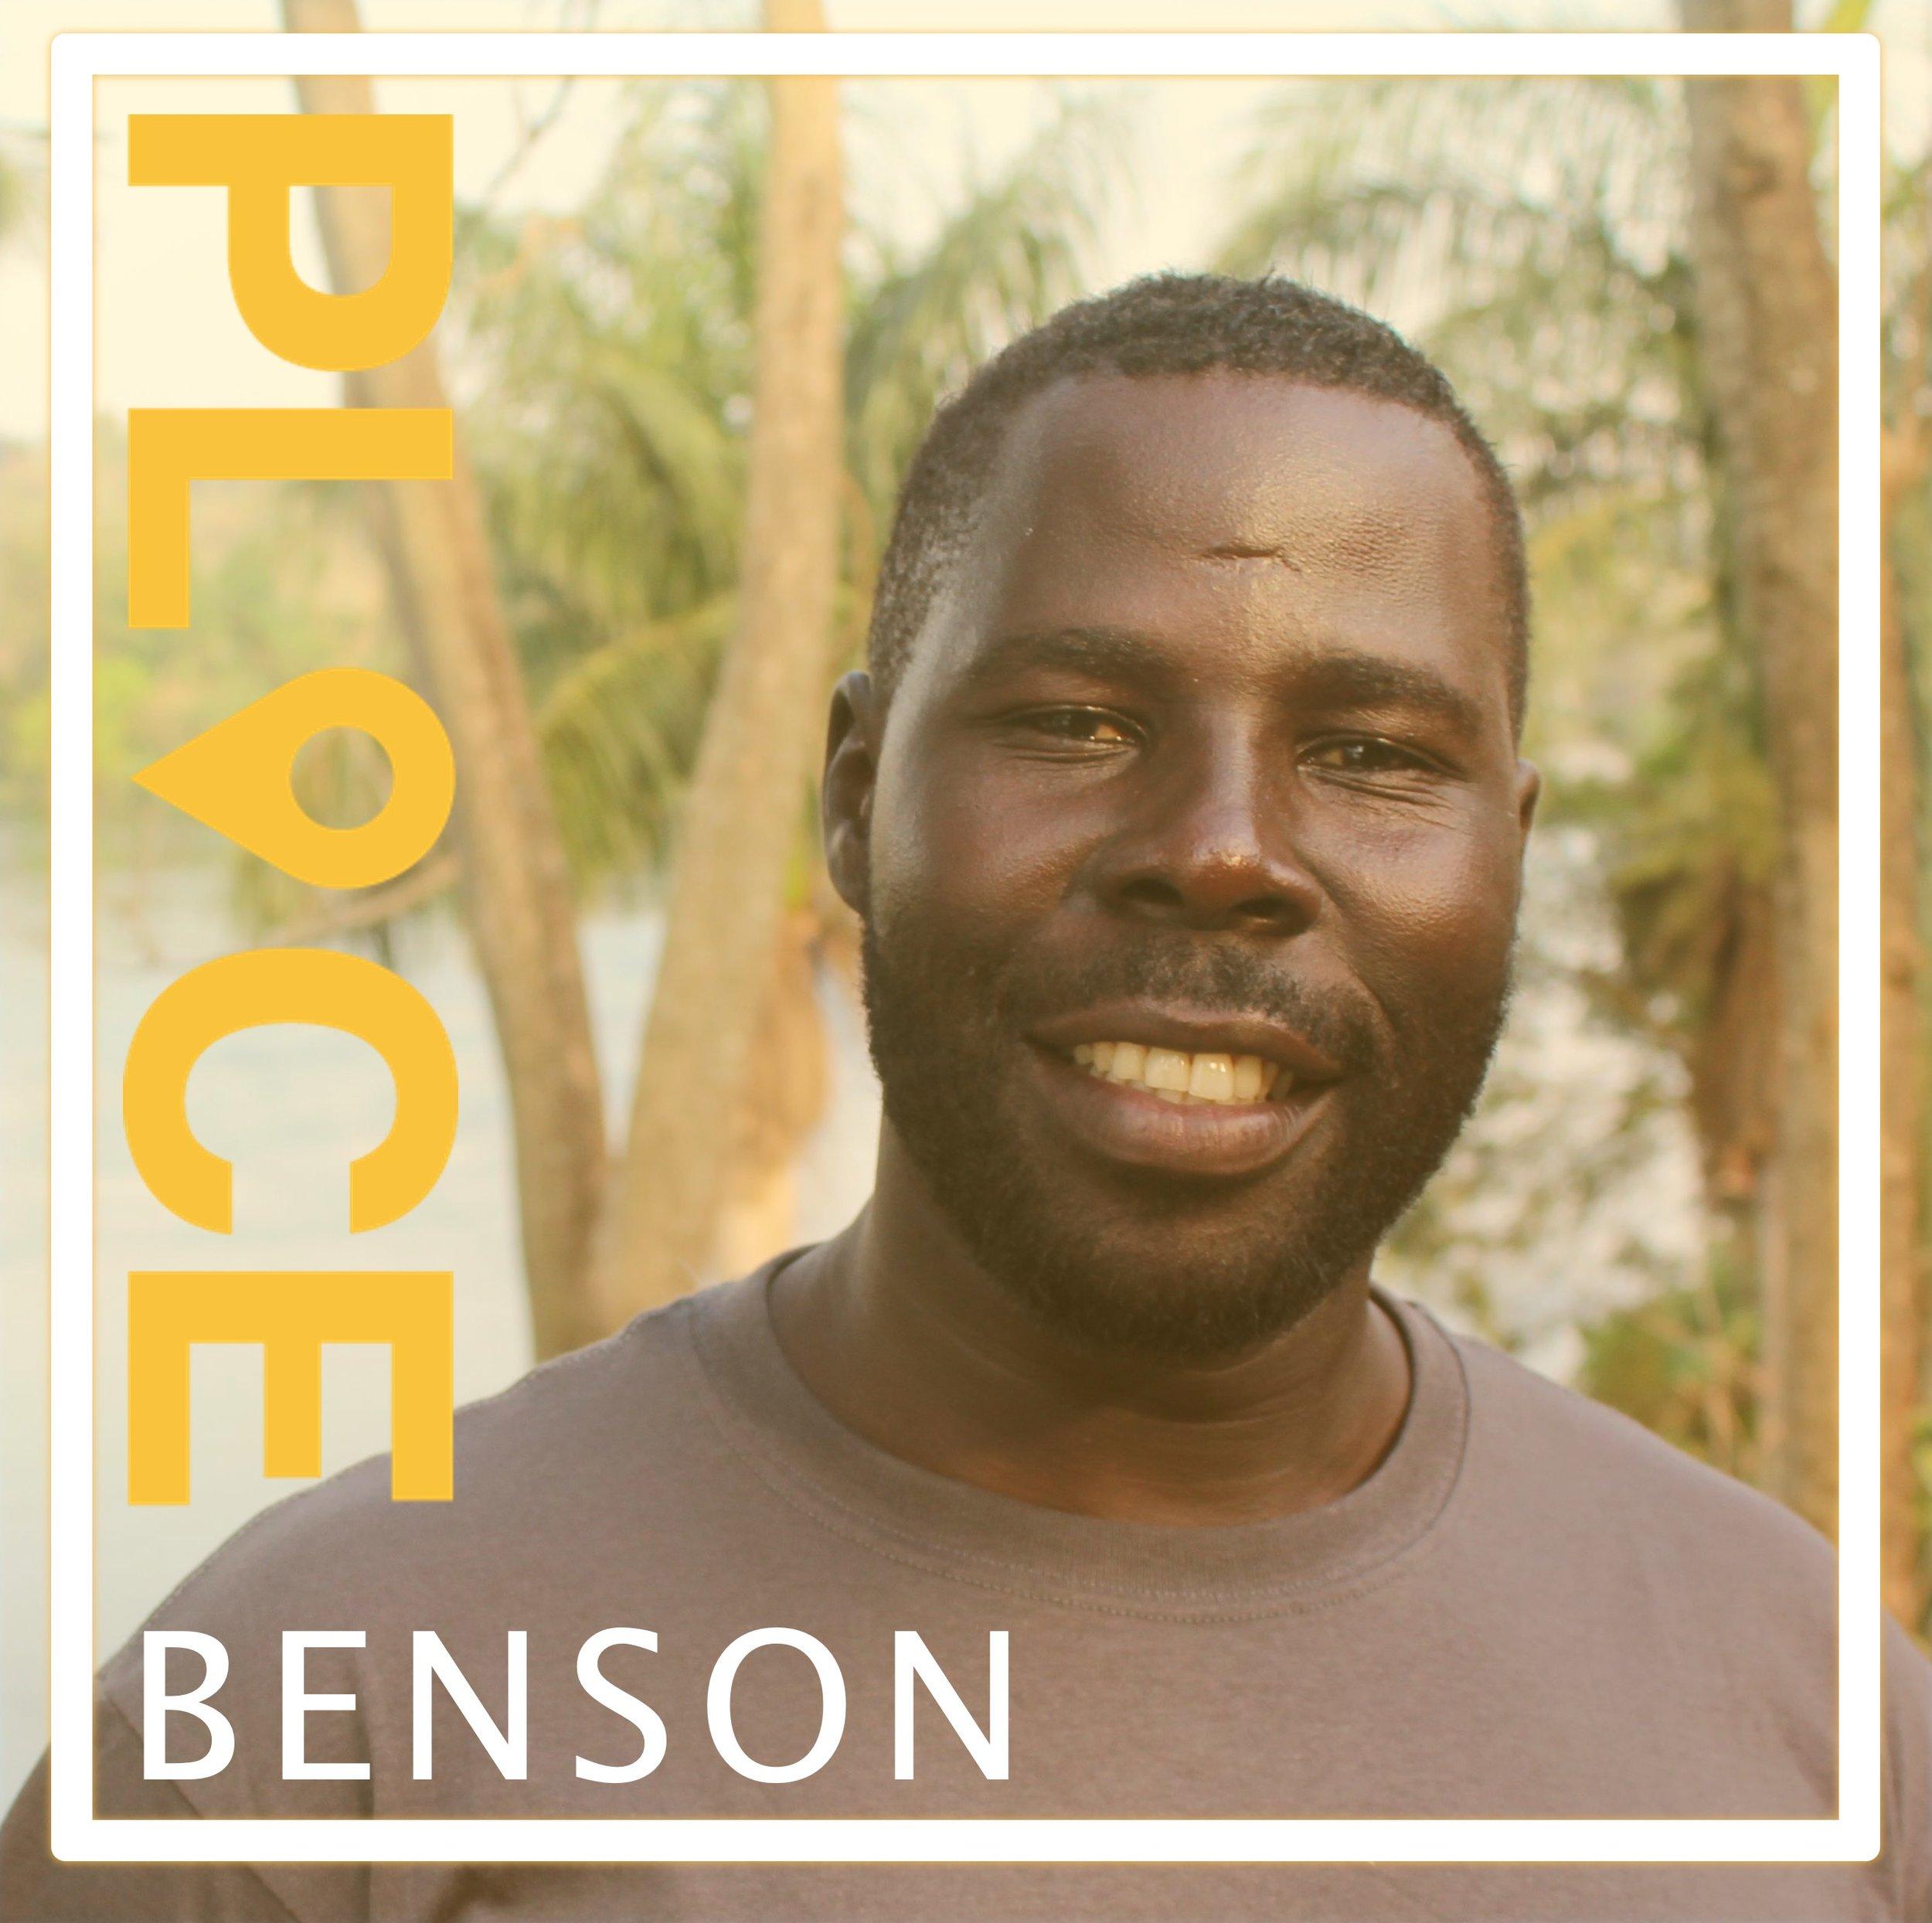 Benson Picture.jpg